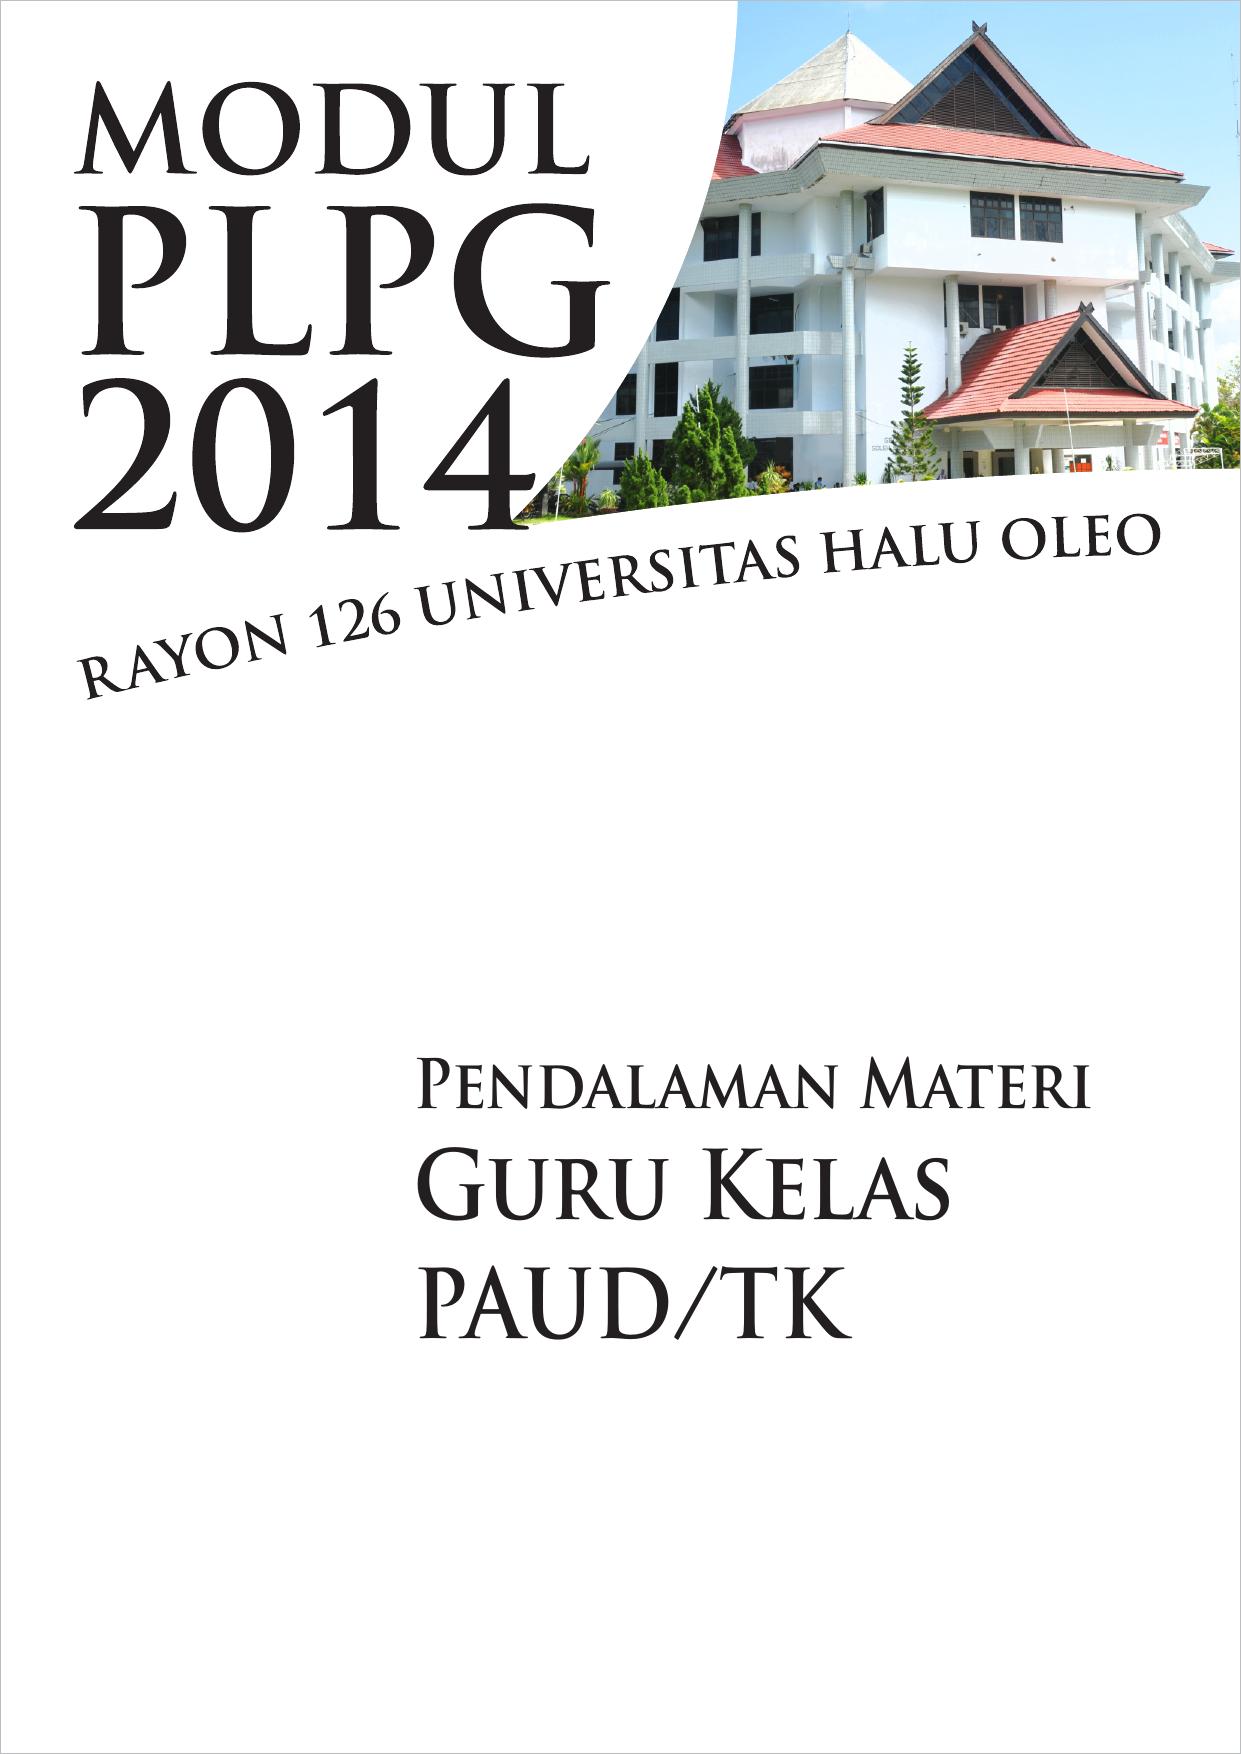 Guru Kelas Paud Tk Psg126